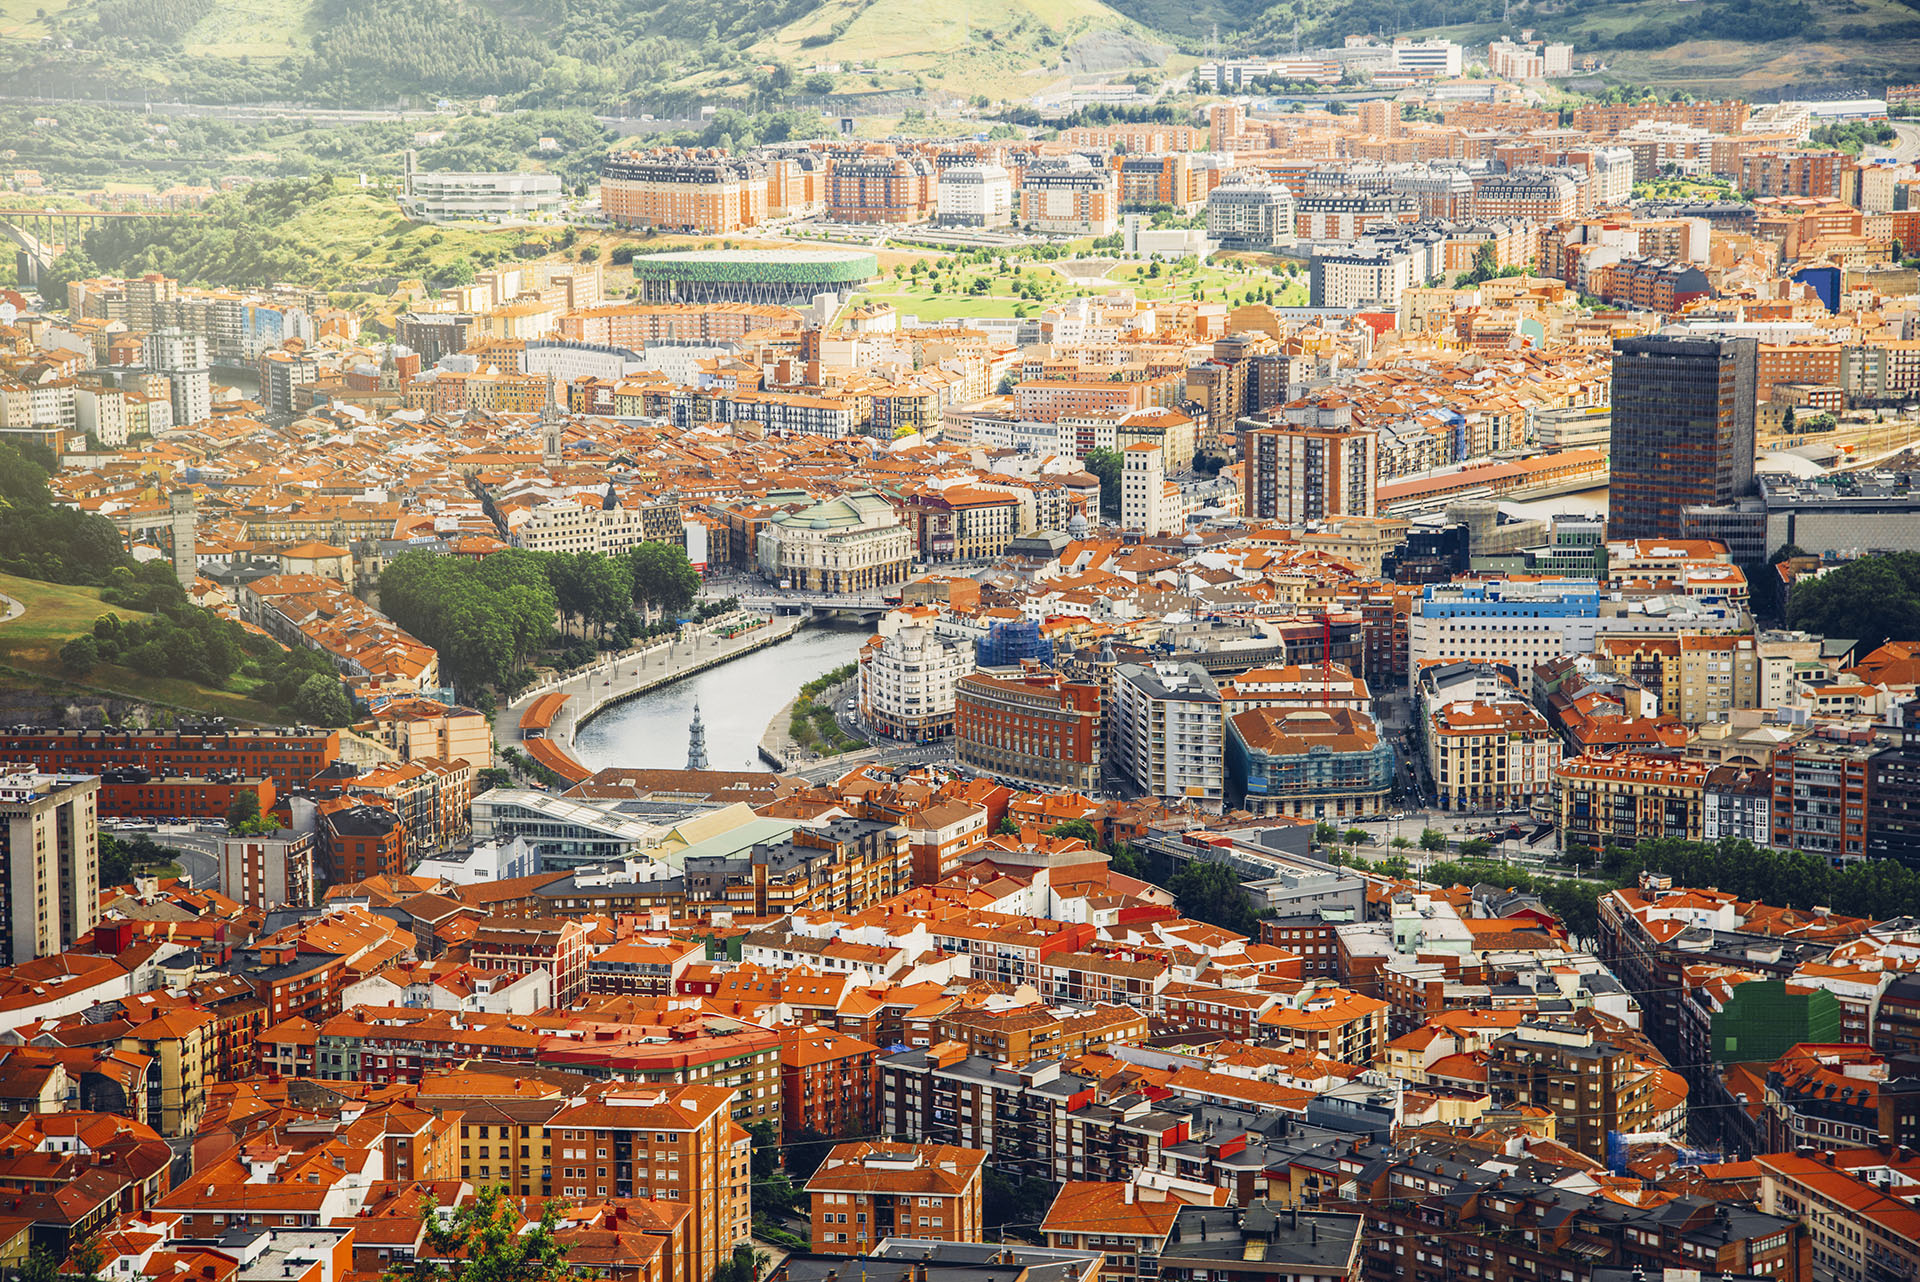 Visite gay de Bilbao